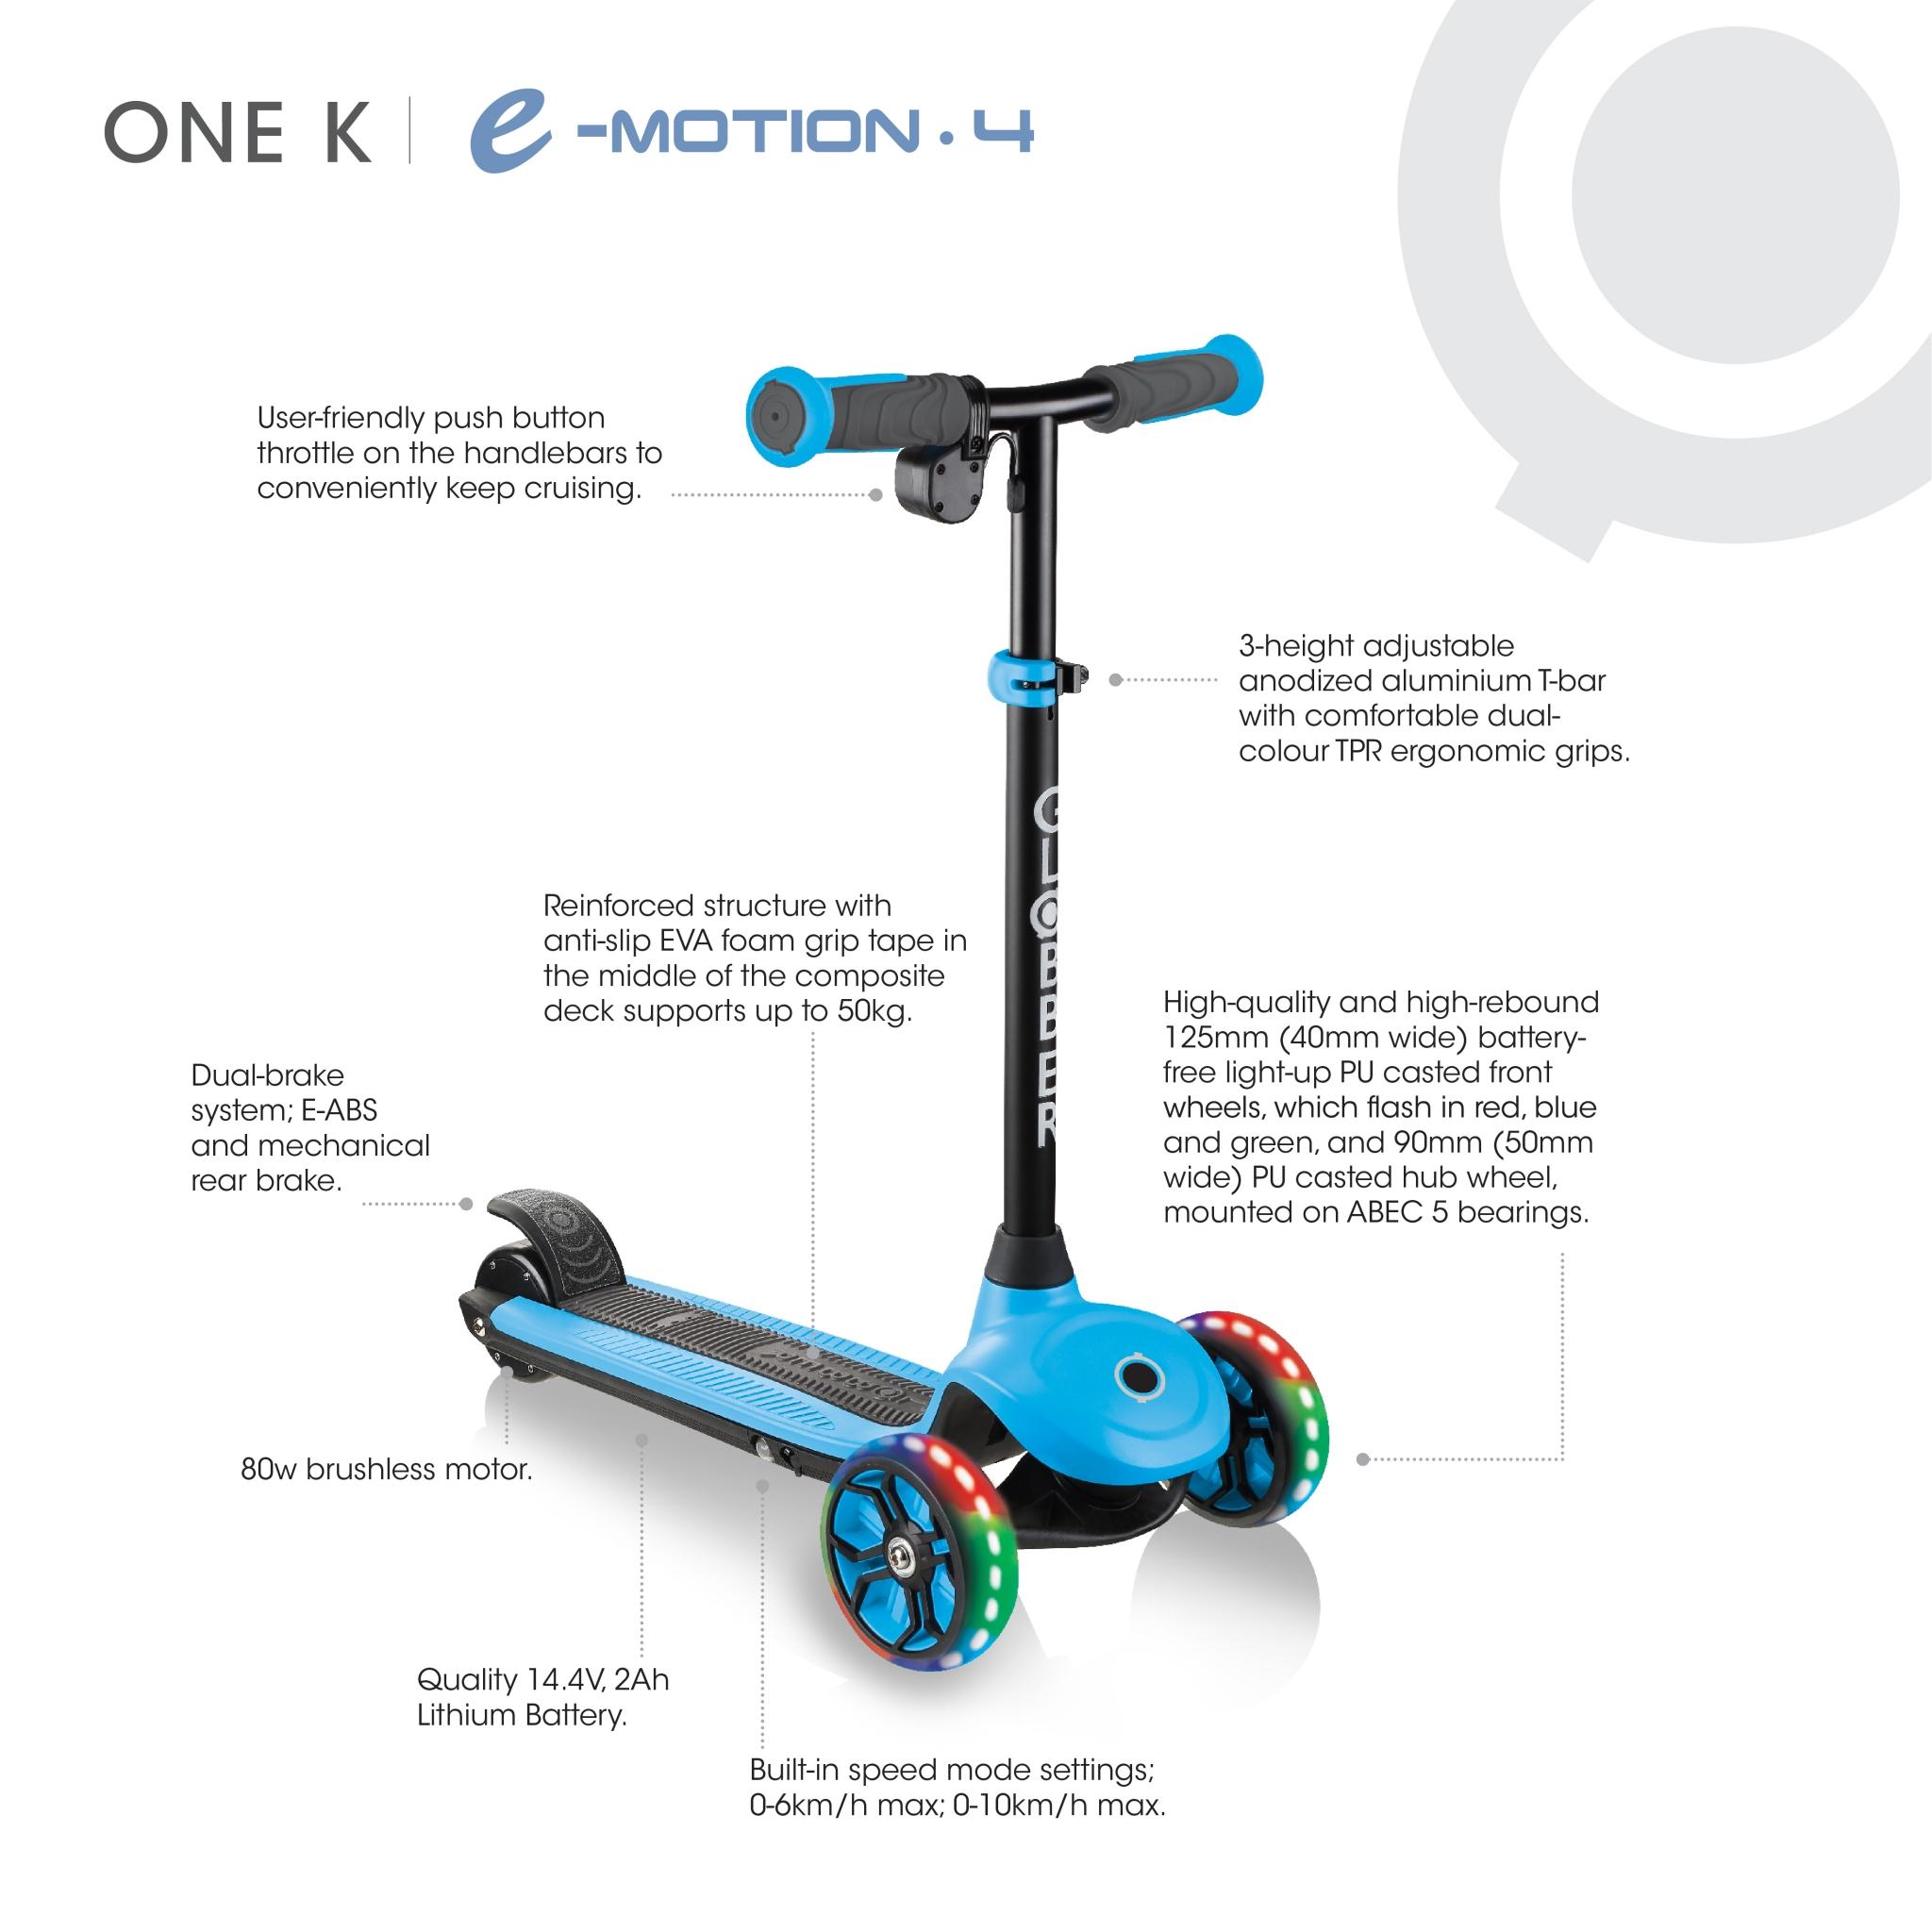 ONE_K_EMOTION-4